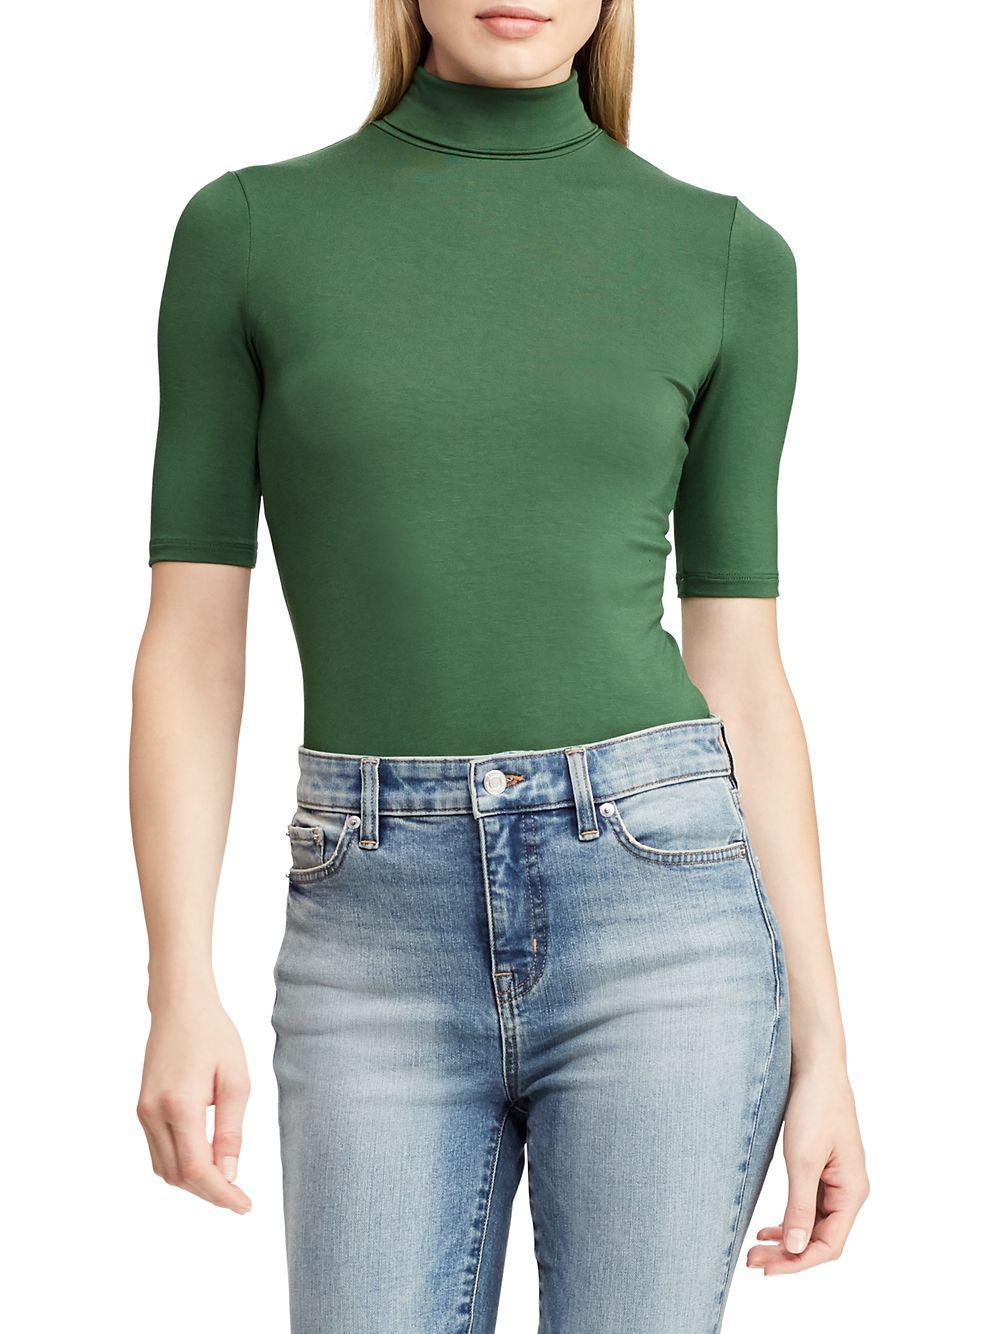 e3356d0b840b02 Lyst - Lauren By Ralph Lauren Knit Turtleneck Top in Green